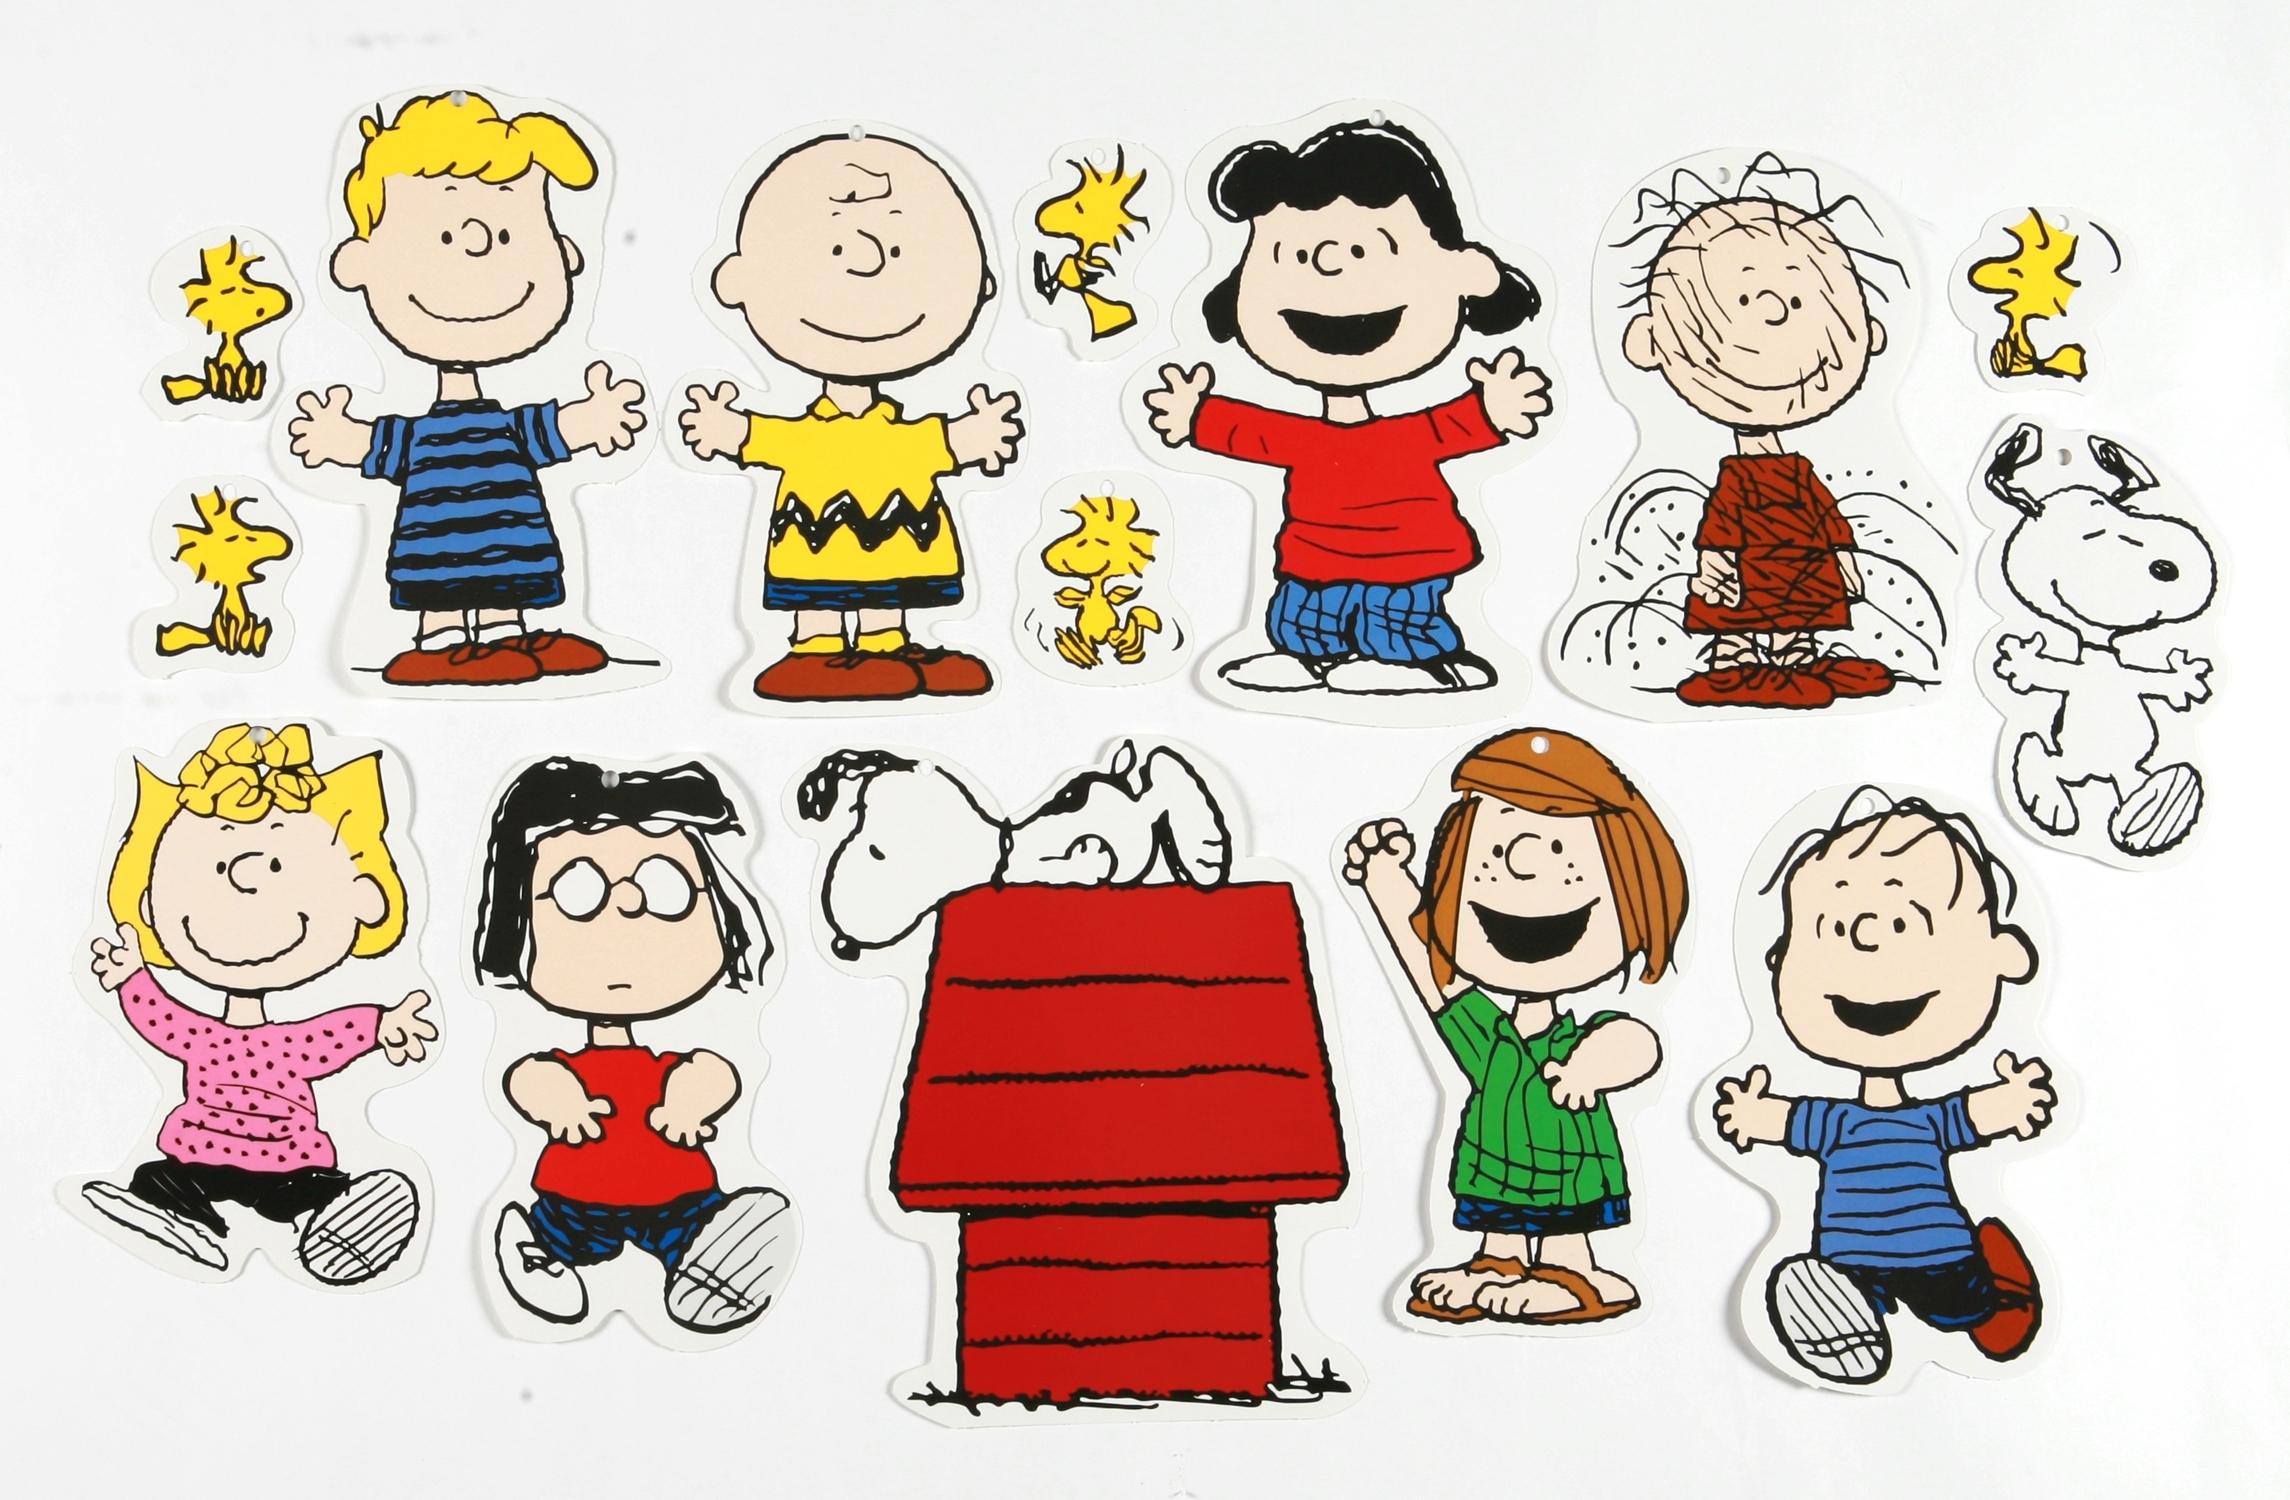 peanuts classic characters 2-sided classroom decor | eureka school